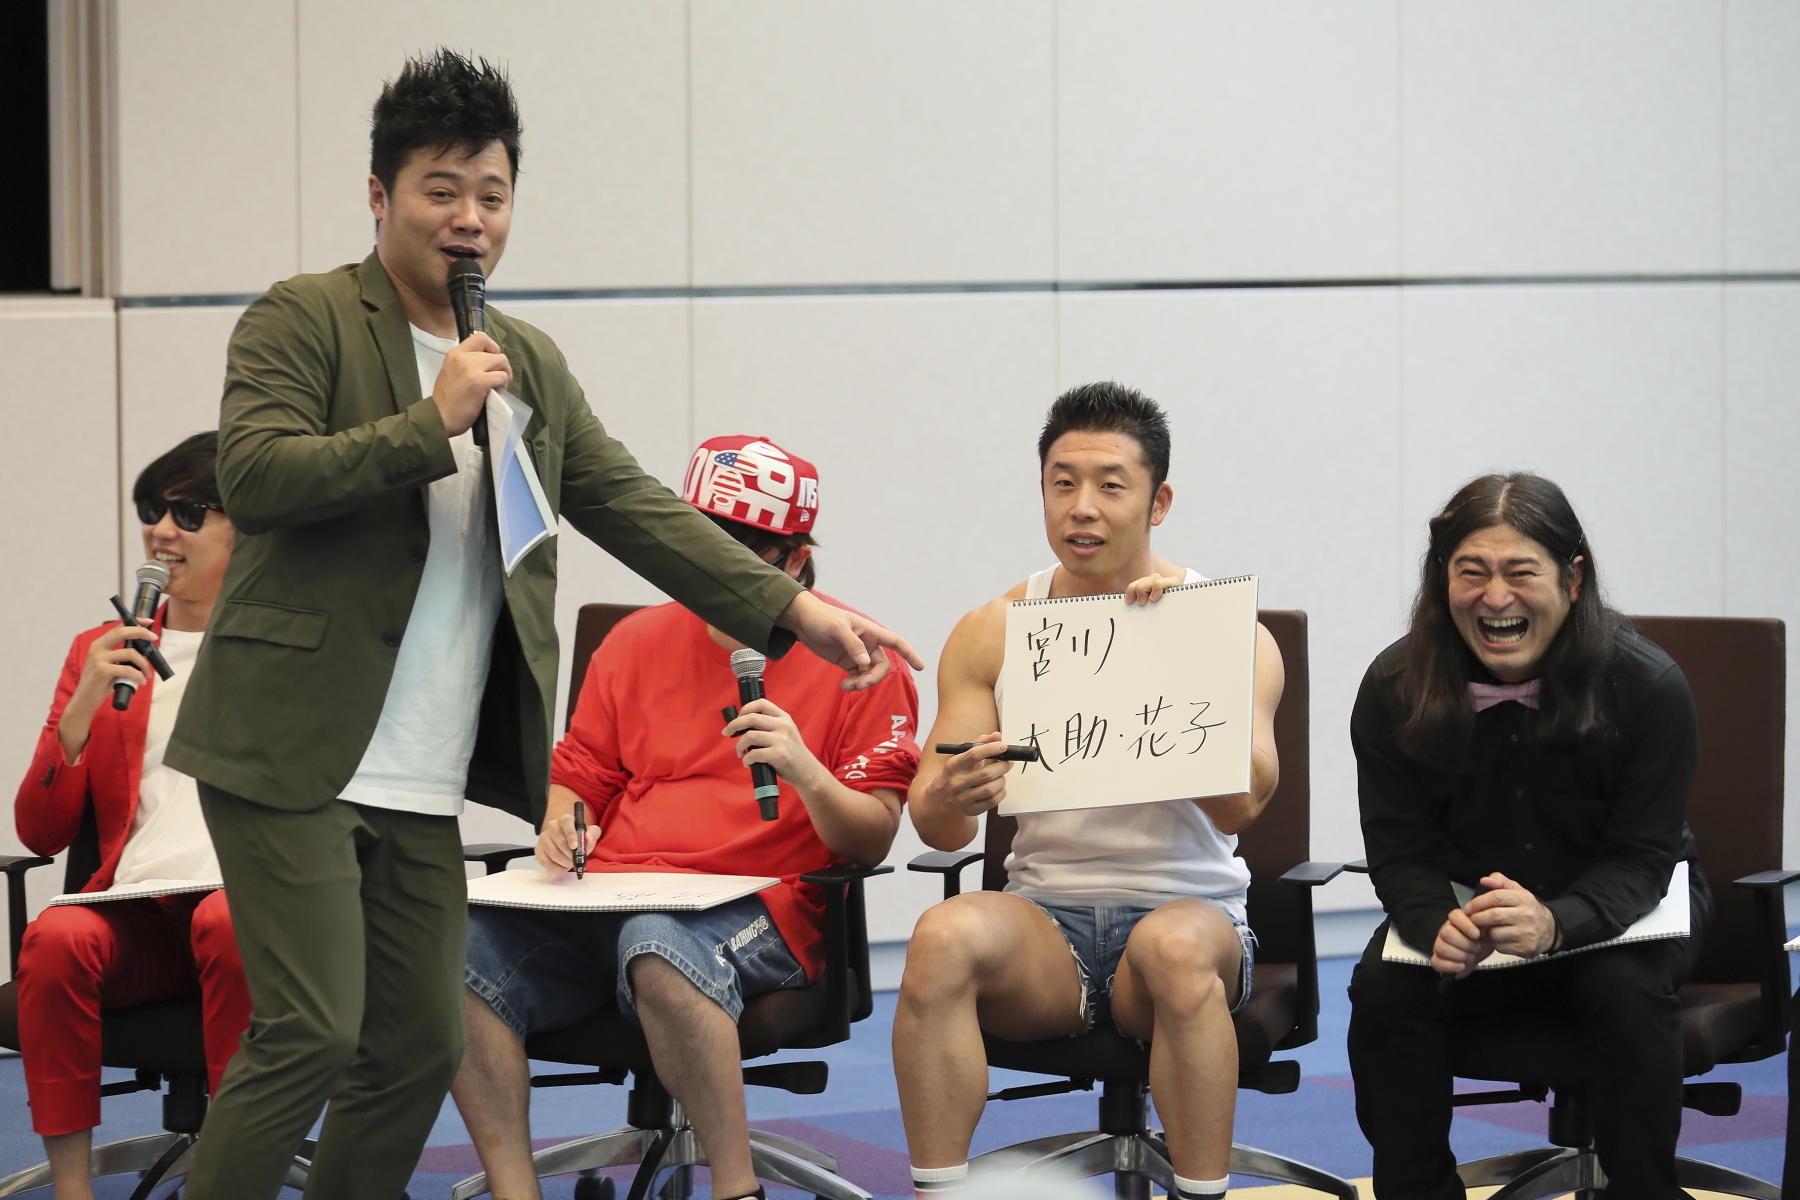 http://news.yoshimoto.co.jp/20181006203806-a9da4de0f75d8e6ba5606a6dece69f07442639ae.jpg